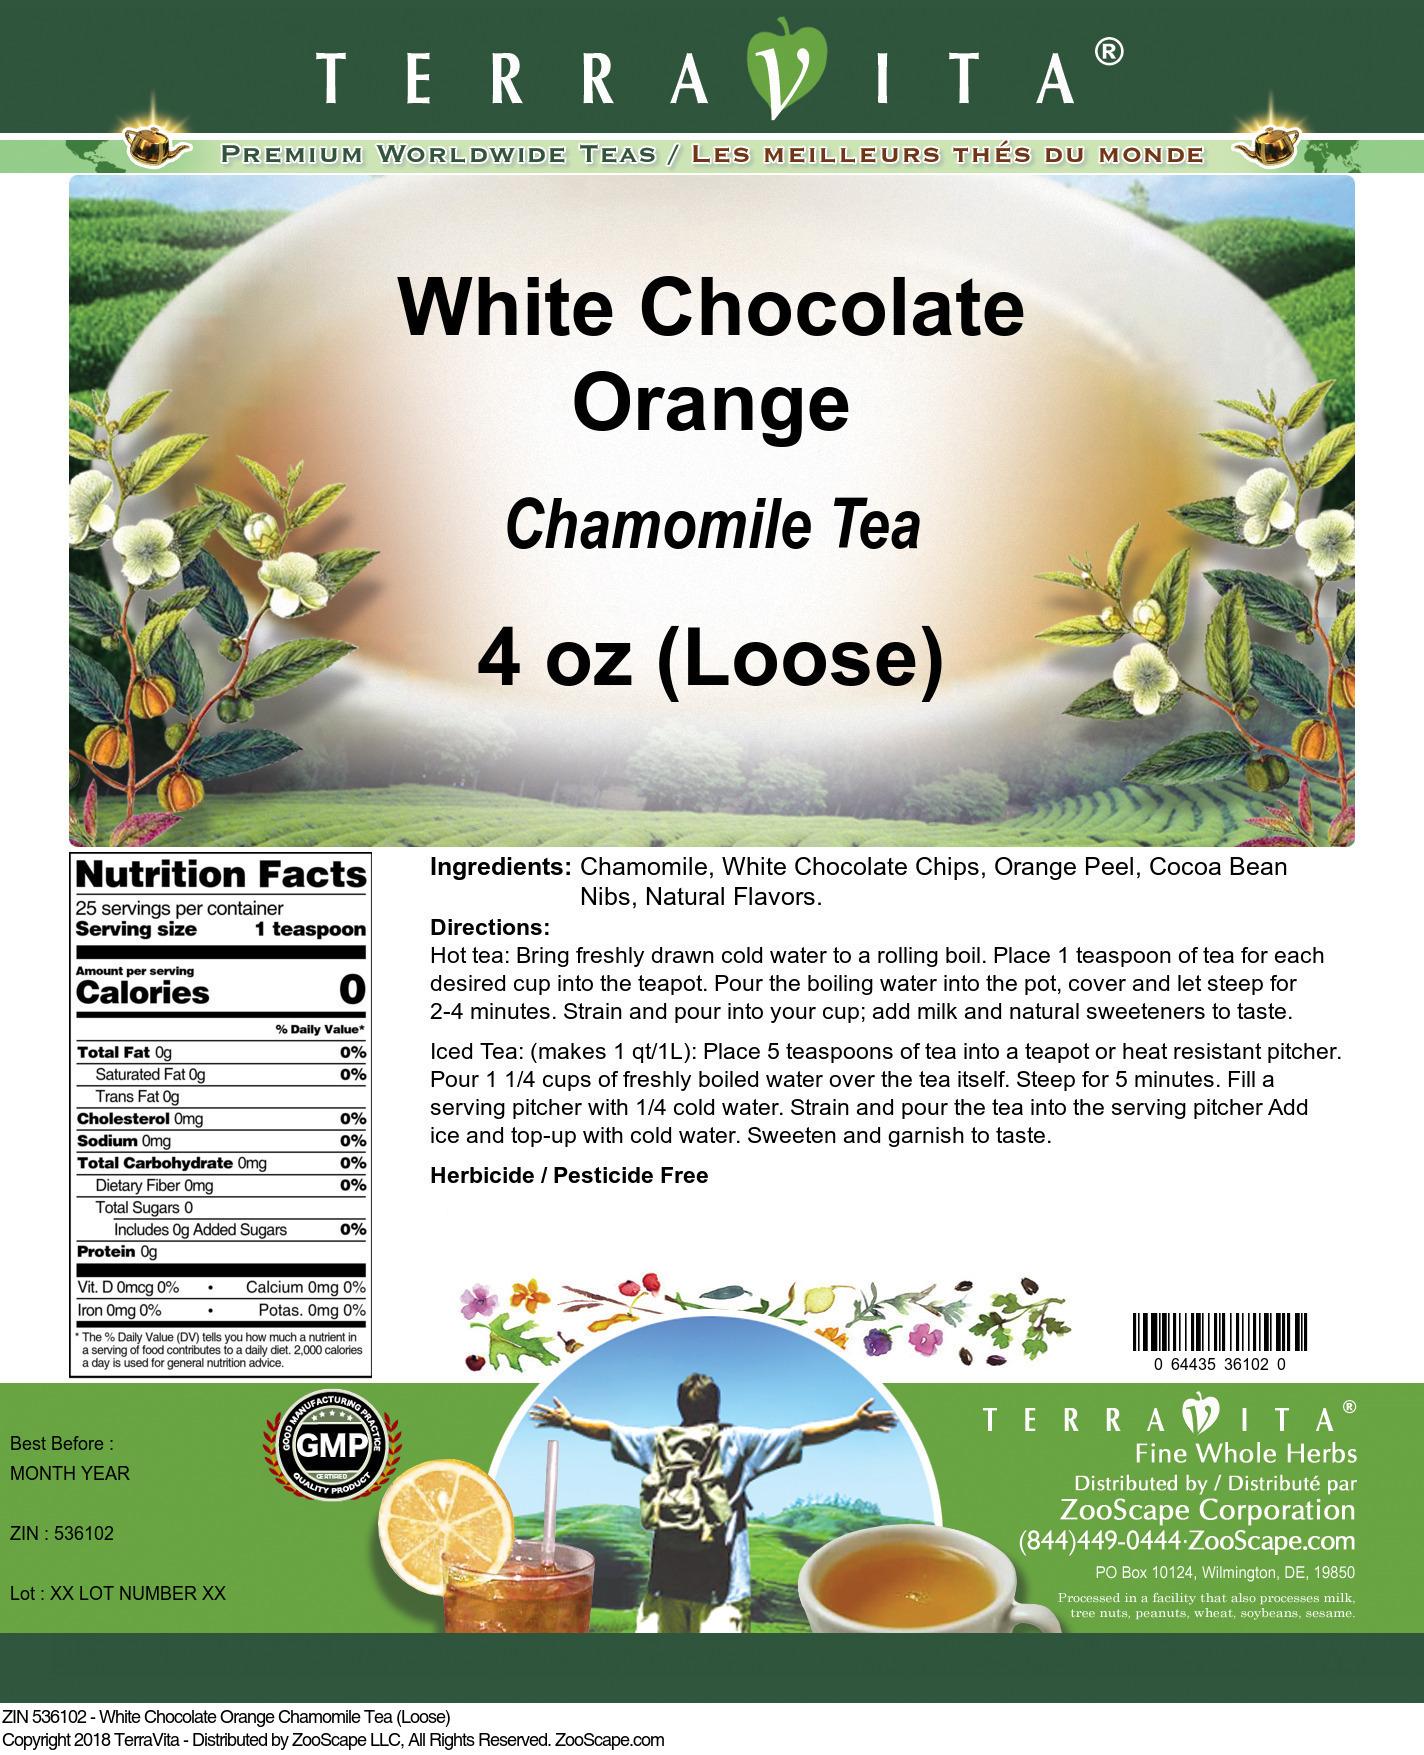 White Chocolate Orange Chamomile Tea (Loose)